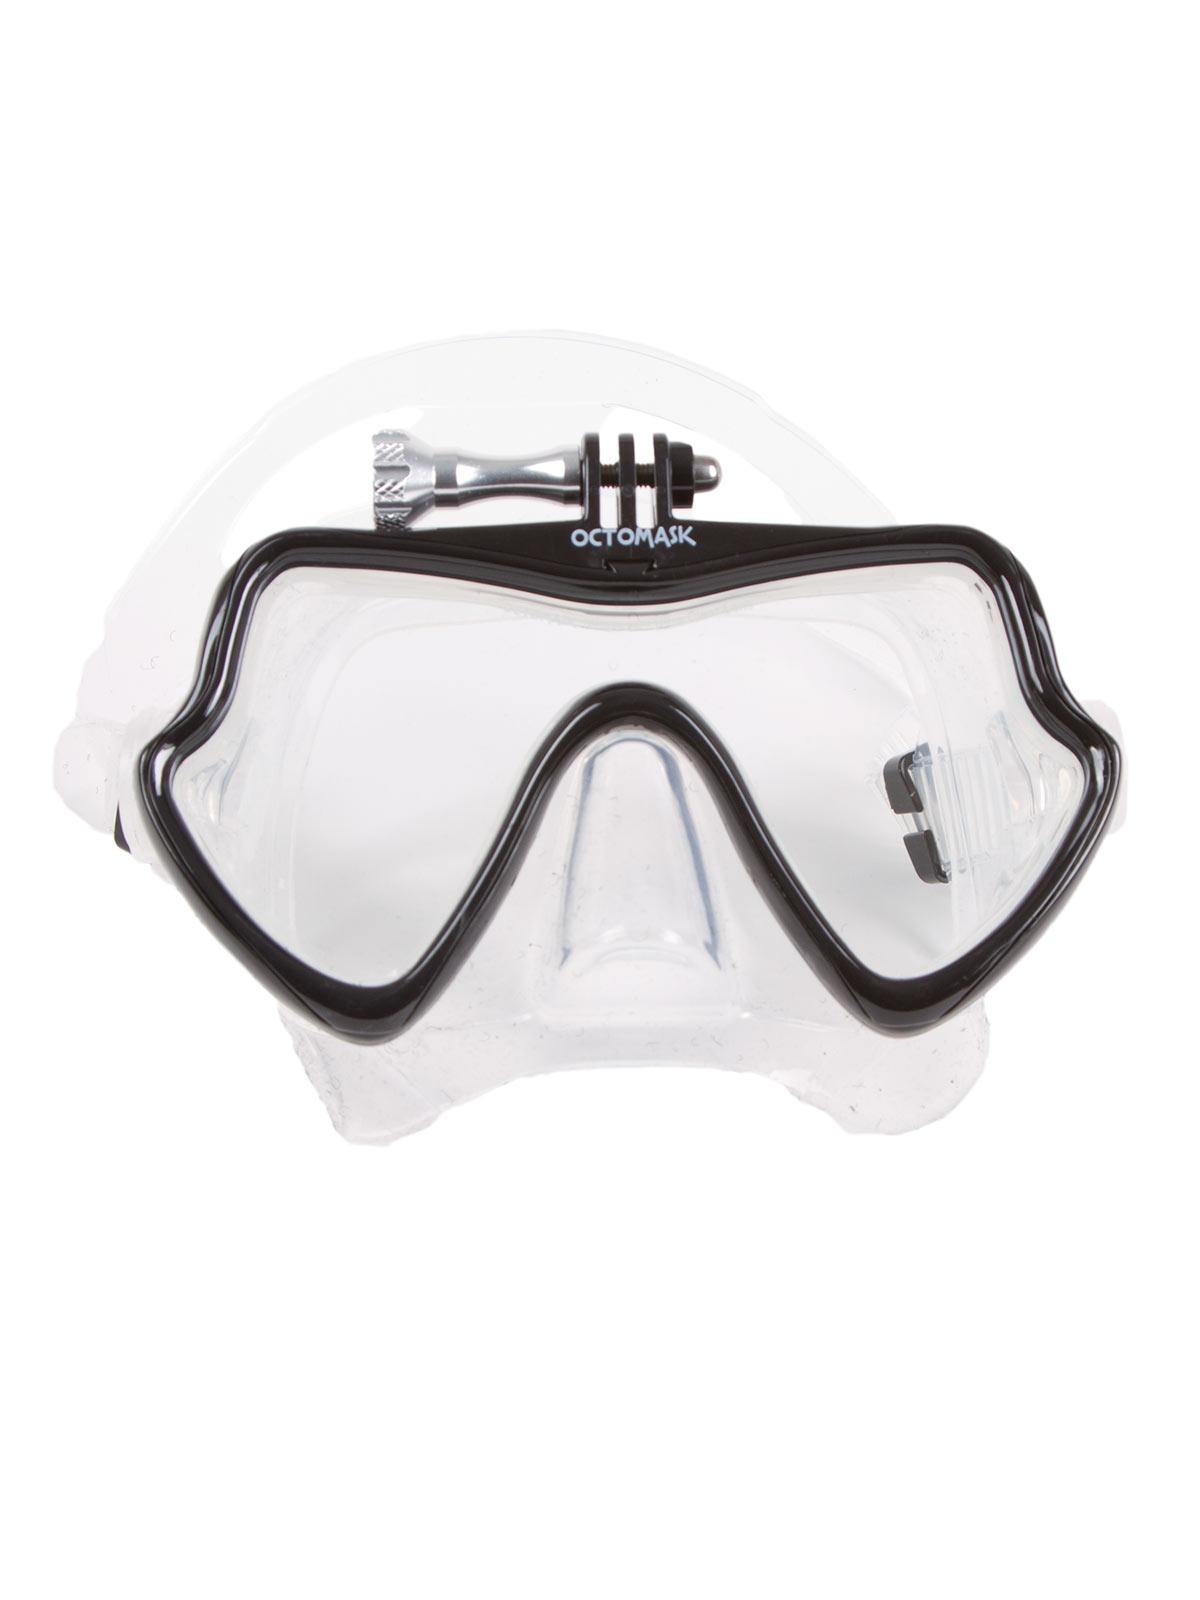 9c120cba499c Octomask Frameless  Scuba   Snorkeling Mask with GoPro Mount